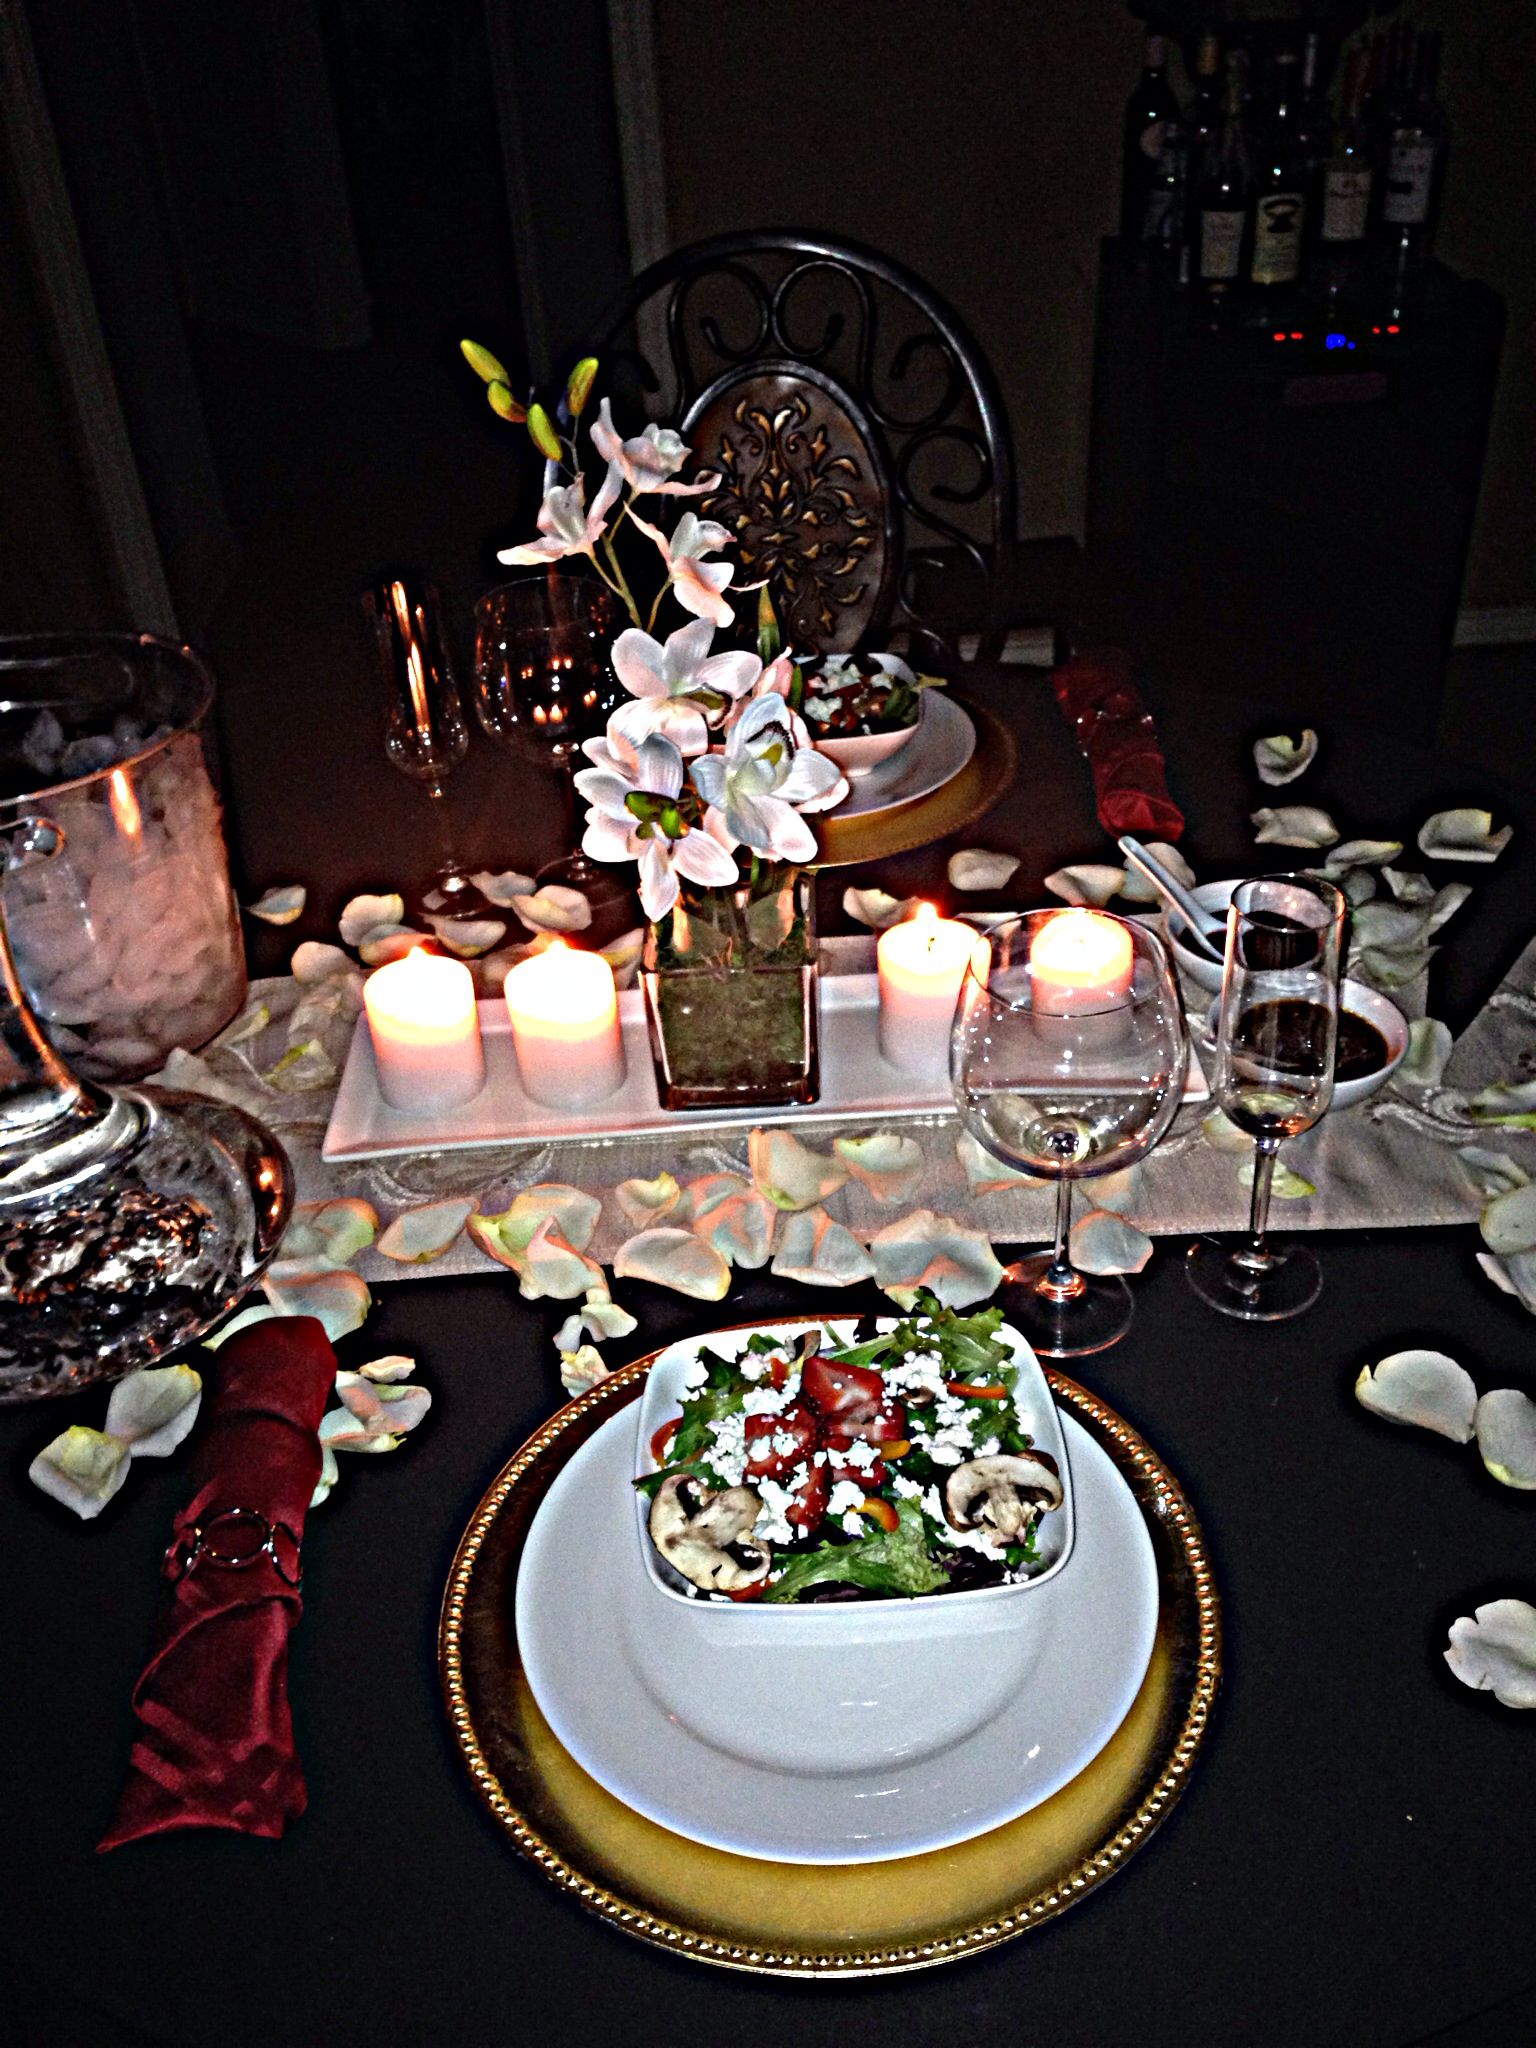 Couples Dinner Party Ideas Part - 41: Dinner Ideas, Romantic, Couples, Date Night, Date Ideas,